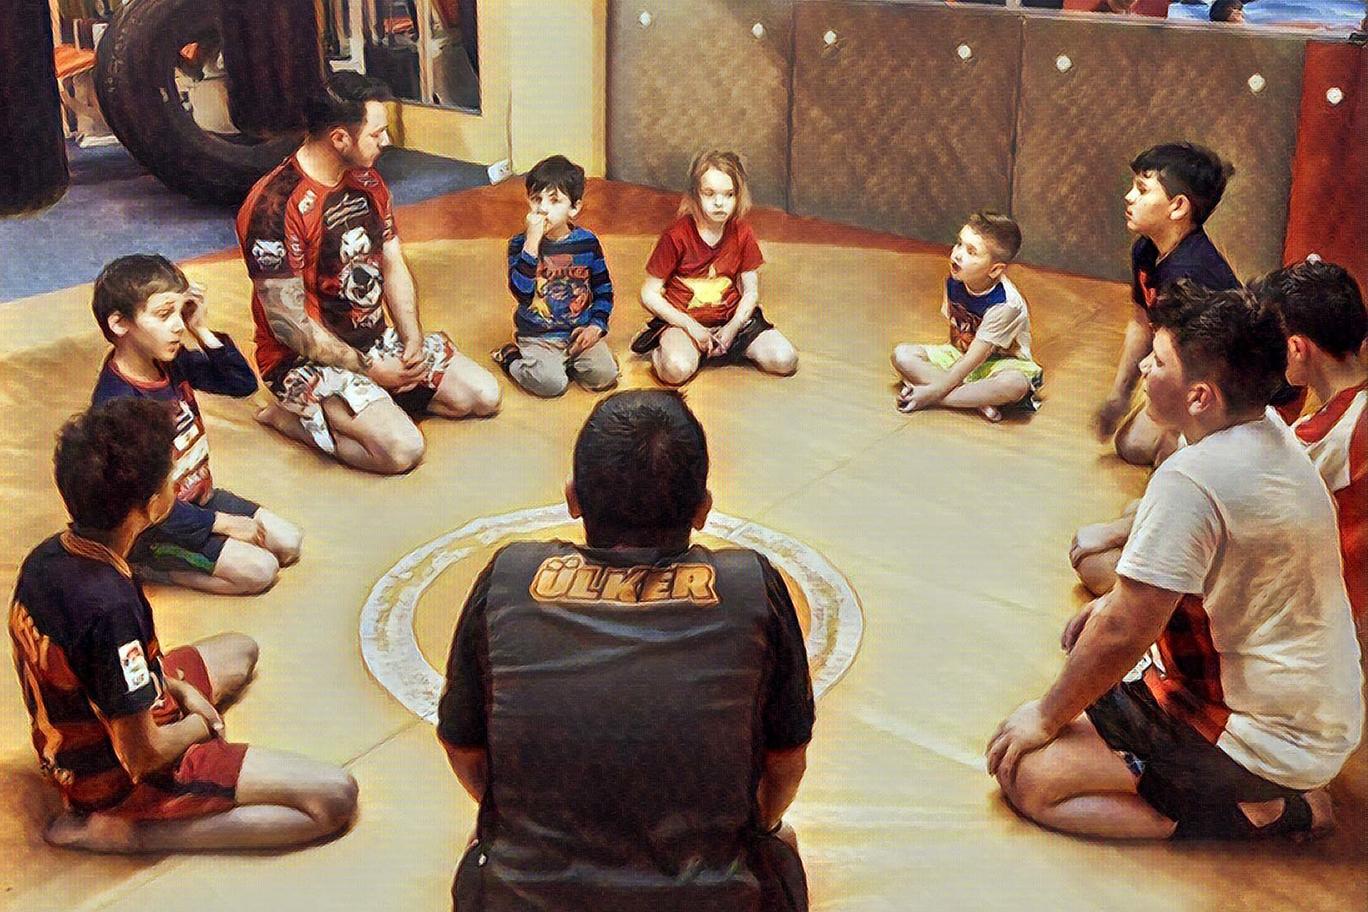 Kids Kickboxen 2 - Lee-Gym